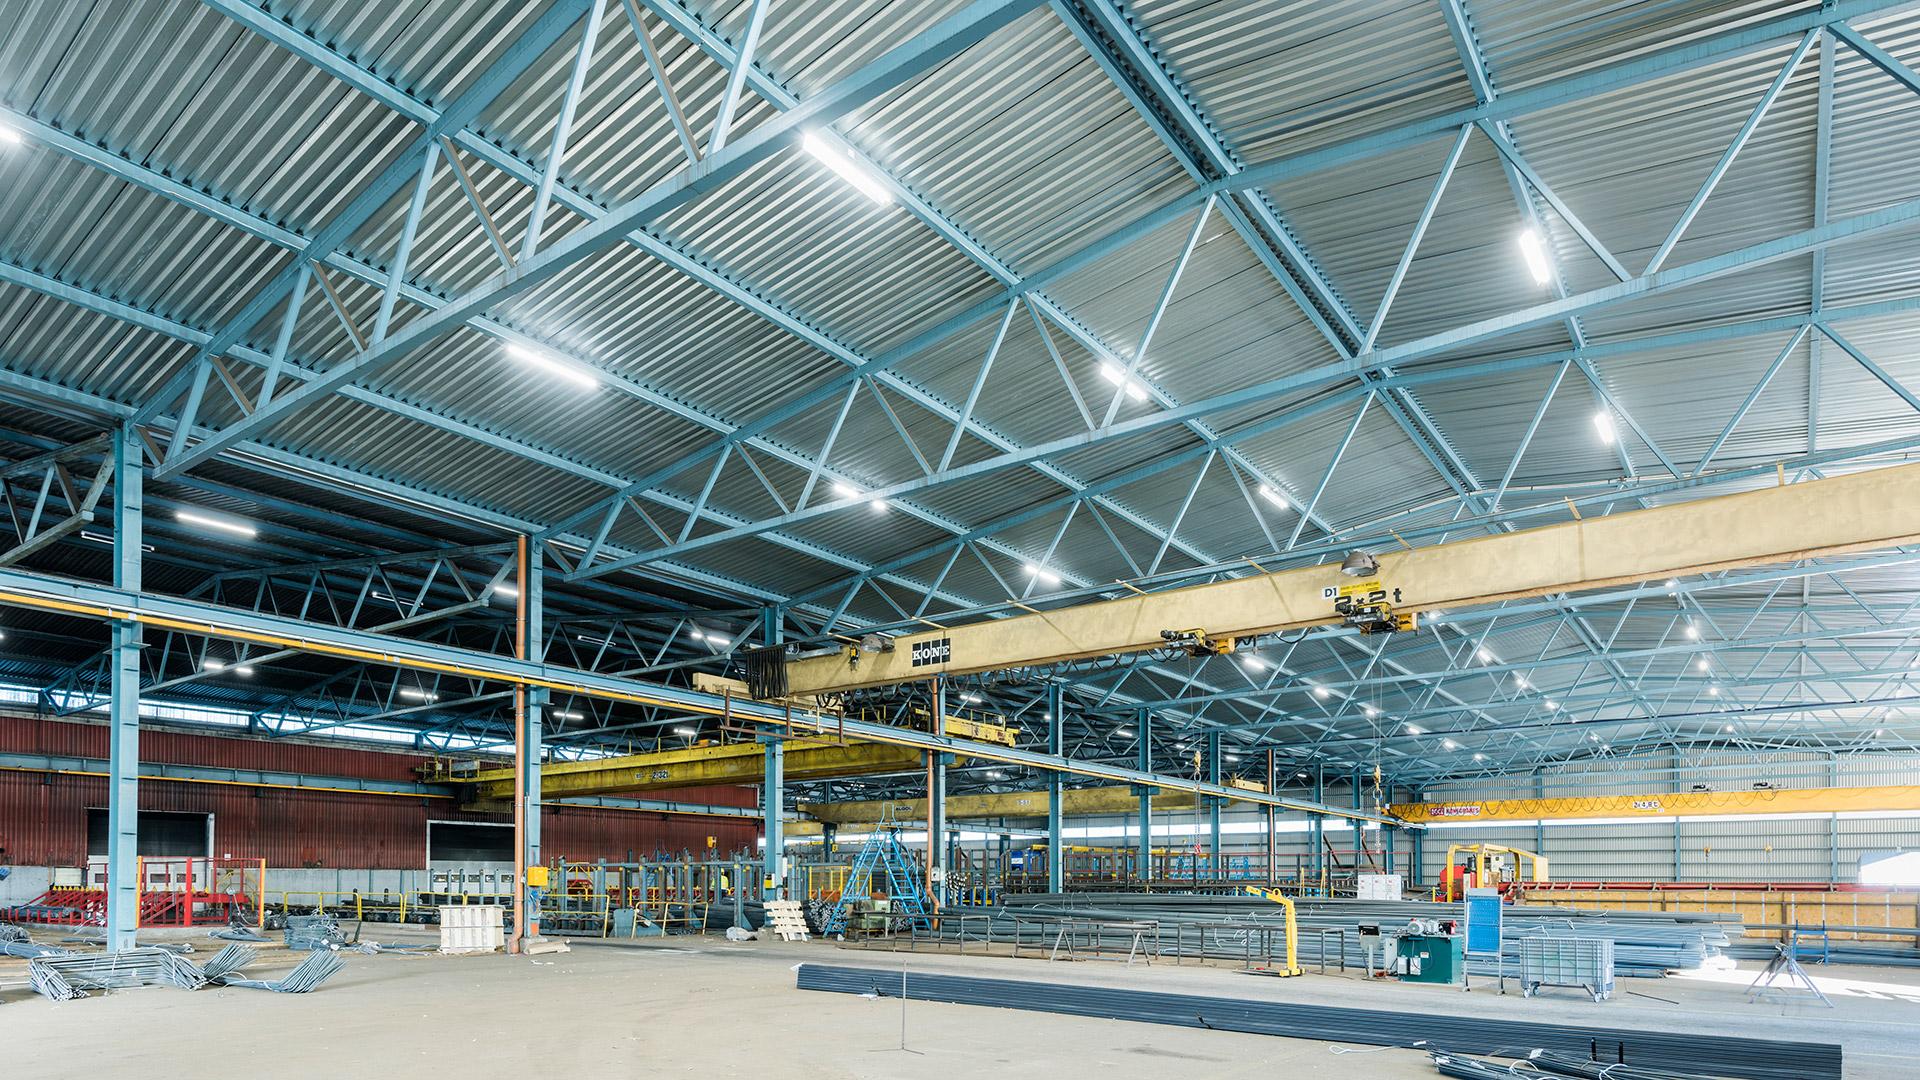 Celsa Steel Service_ECOEII_1920x1080